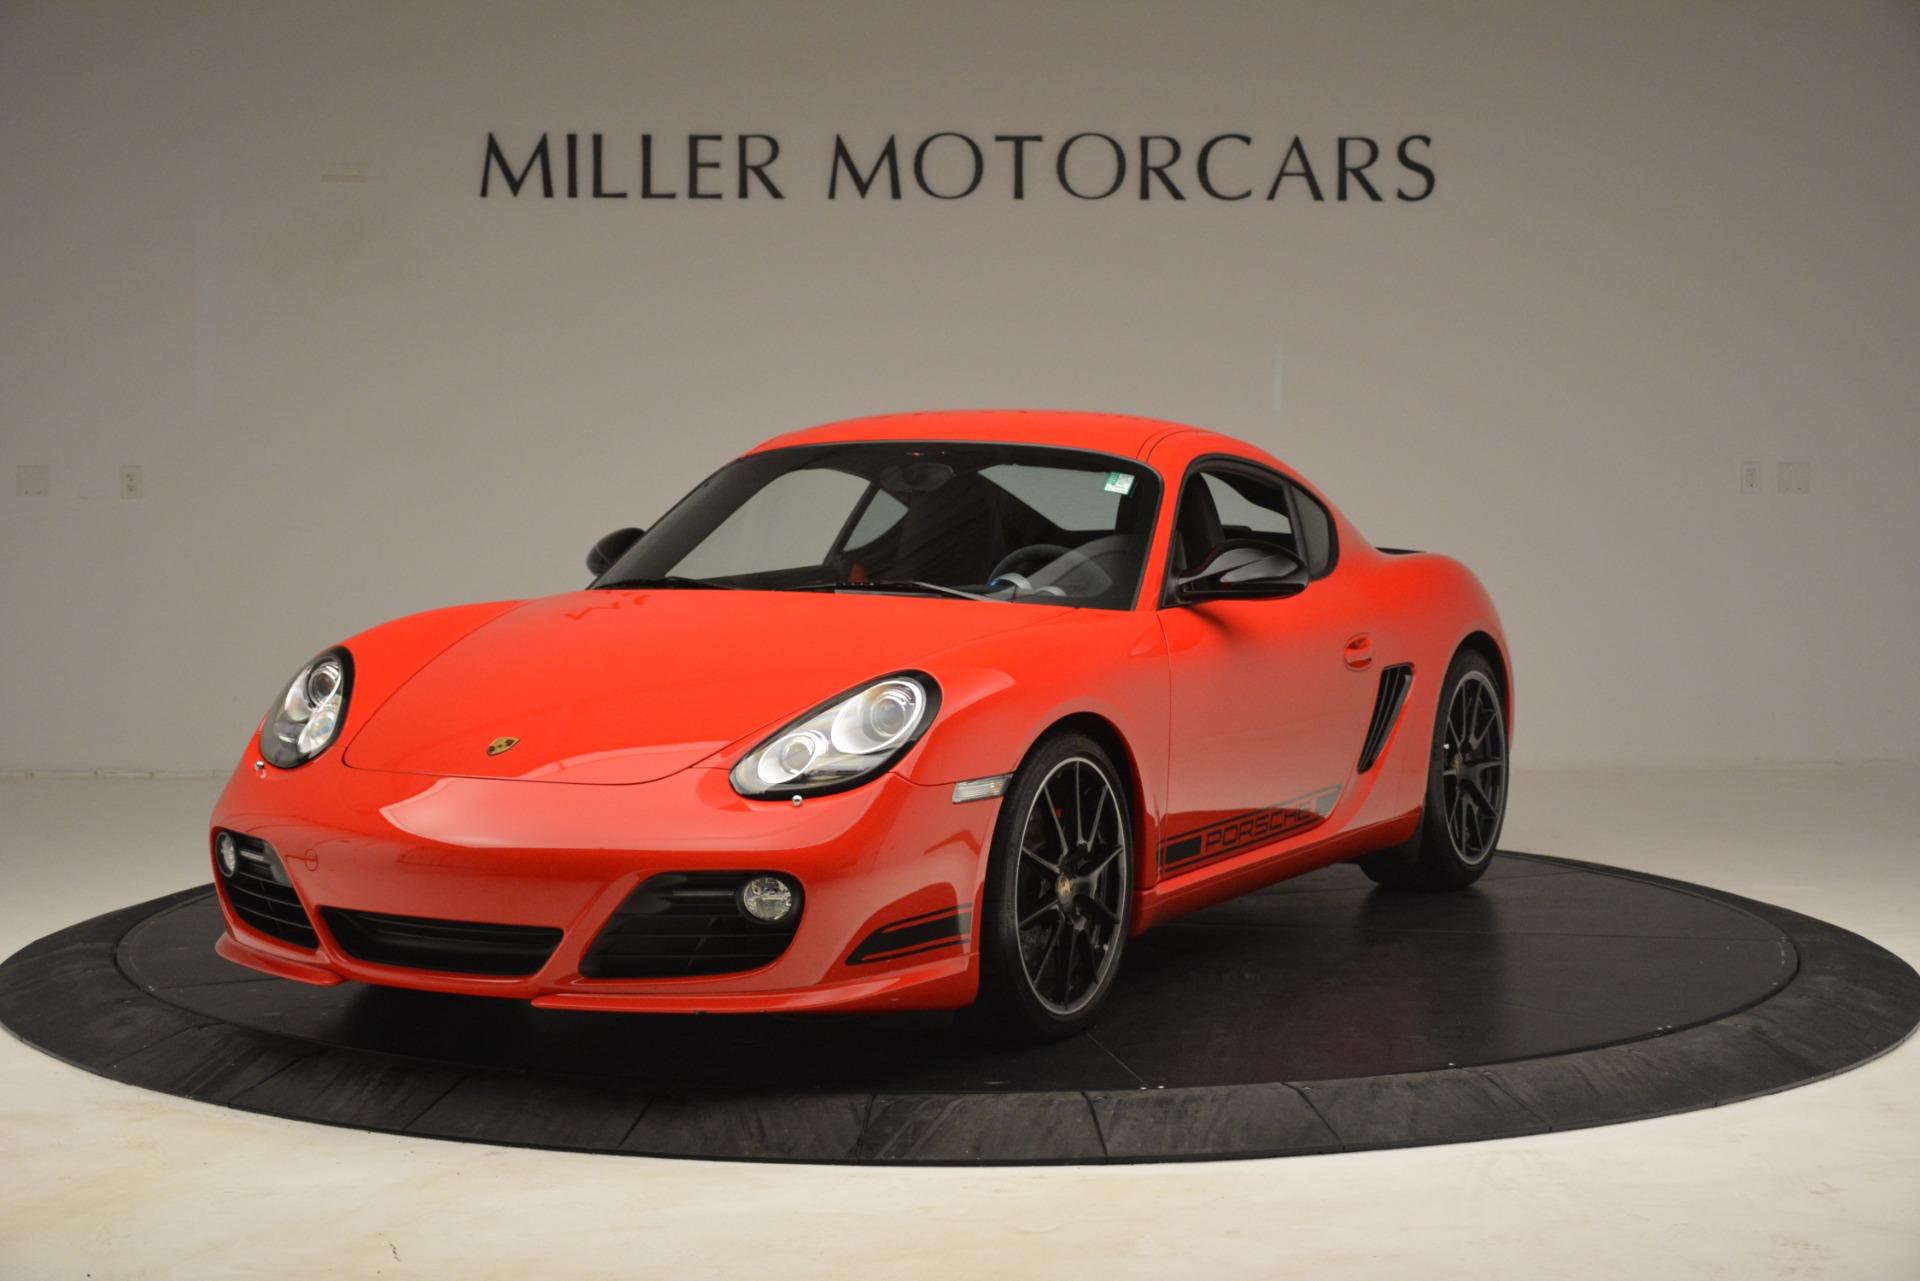 Used 2012 Porsche Cayman R for sale Sold at Bugatti of Greenwich in Greenwich CT 06830 1